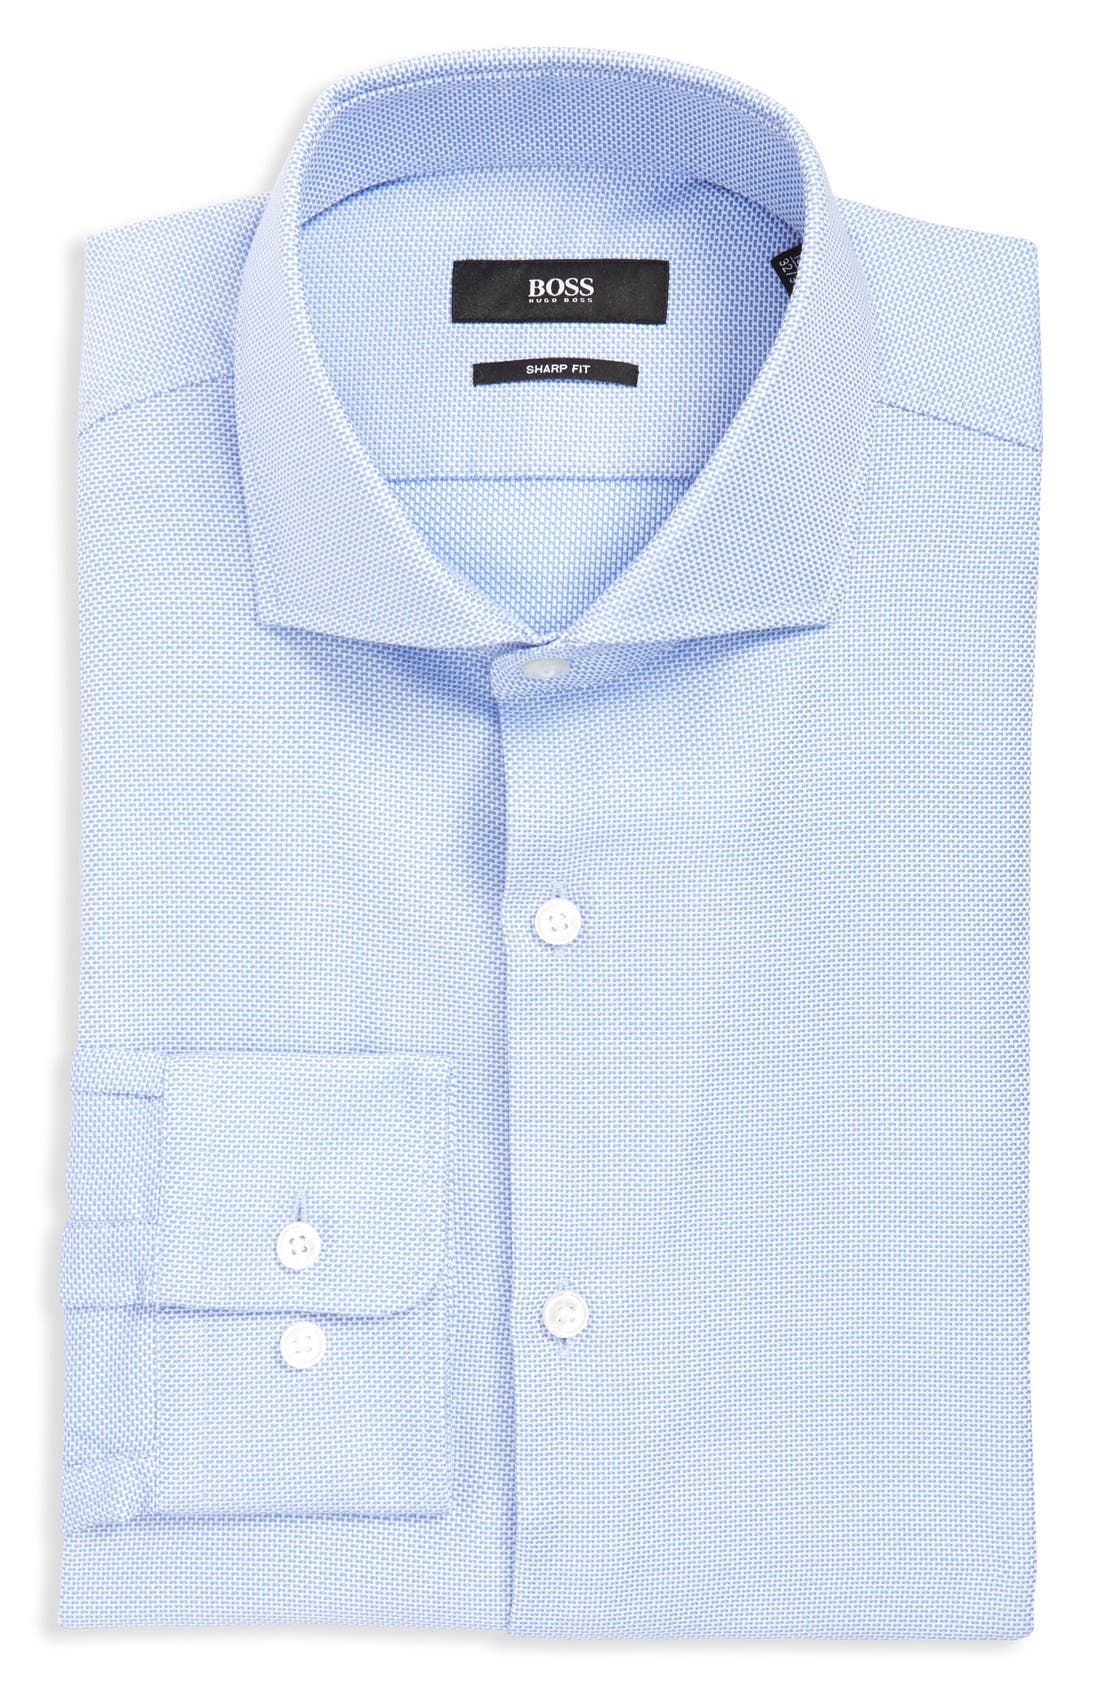 sharp fit dress shirt1418460 Hugo Boss Tuxedo Shirt Nordstrom #13